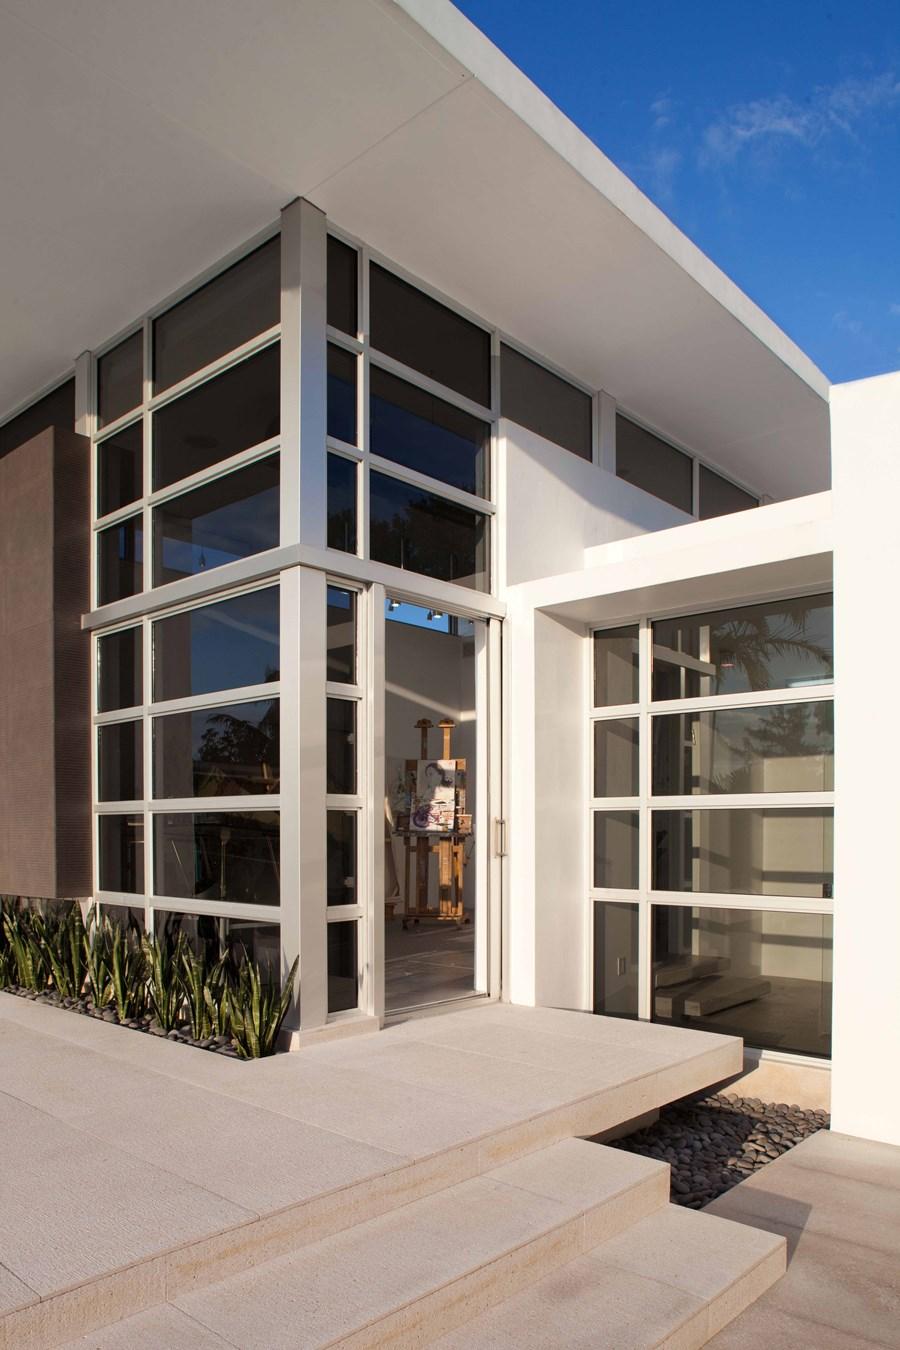 Lakewood Art Studio by KZ Architecture 15